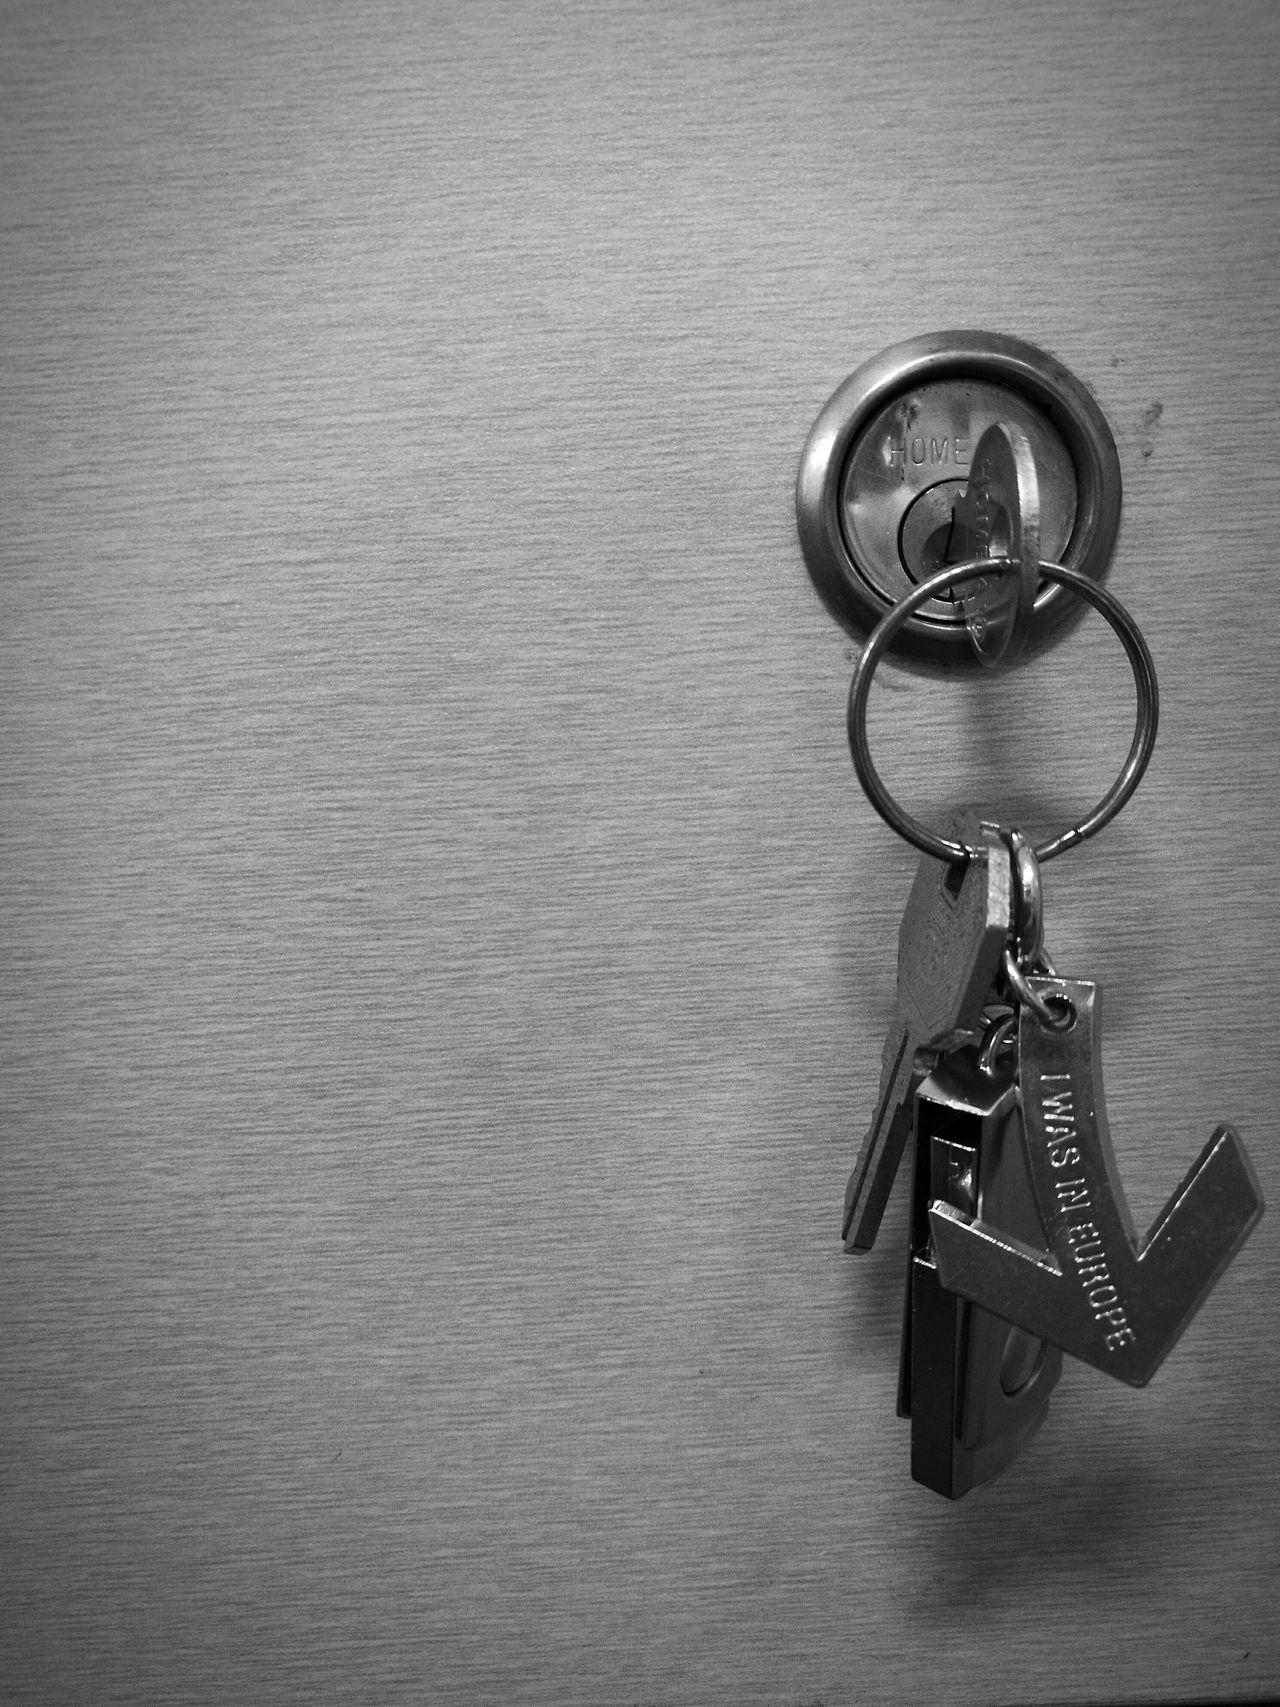 Keychain Close-up No People Indoors  Architecture Drawer Keys Keys Photography Arrow Black Blackandwhite Black & White HuaweiP9Photography HuaweiP9 Monochrome